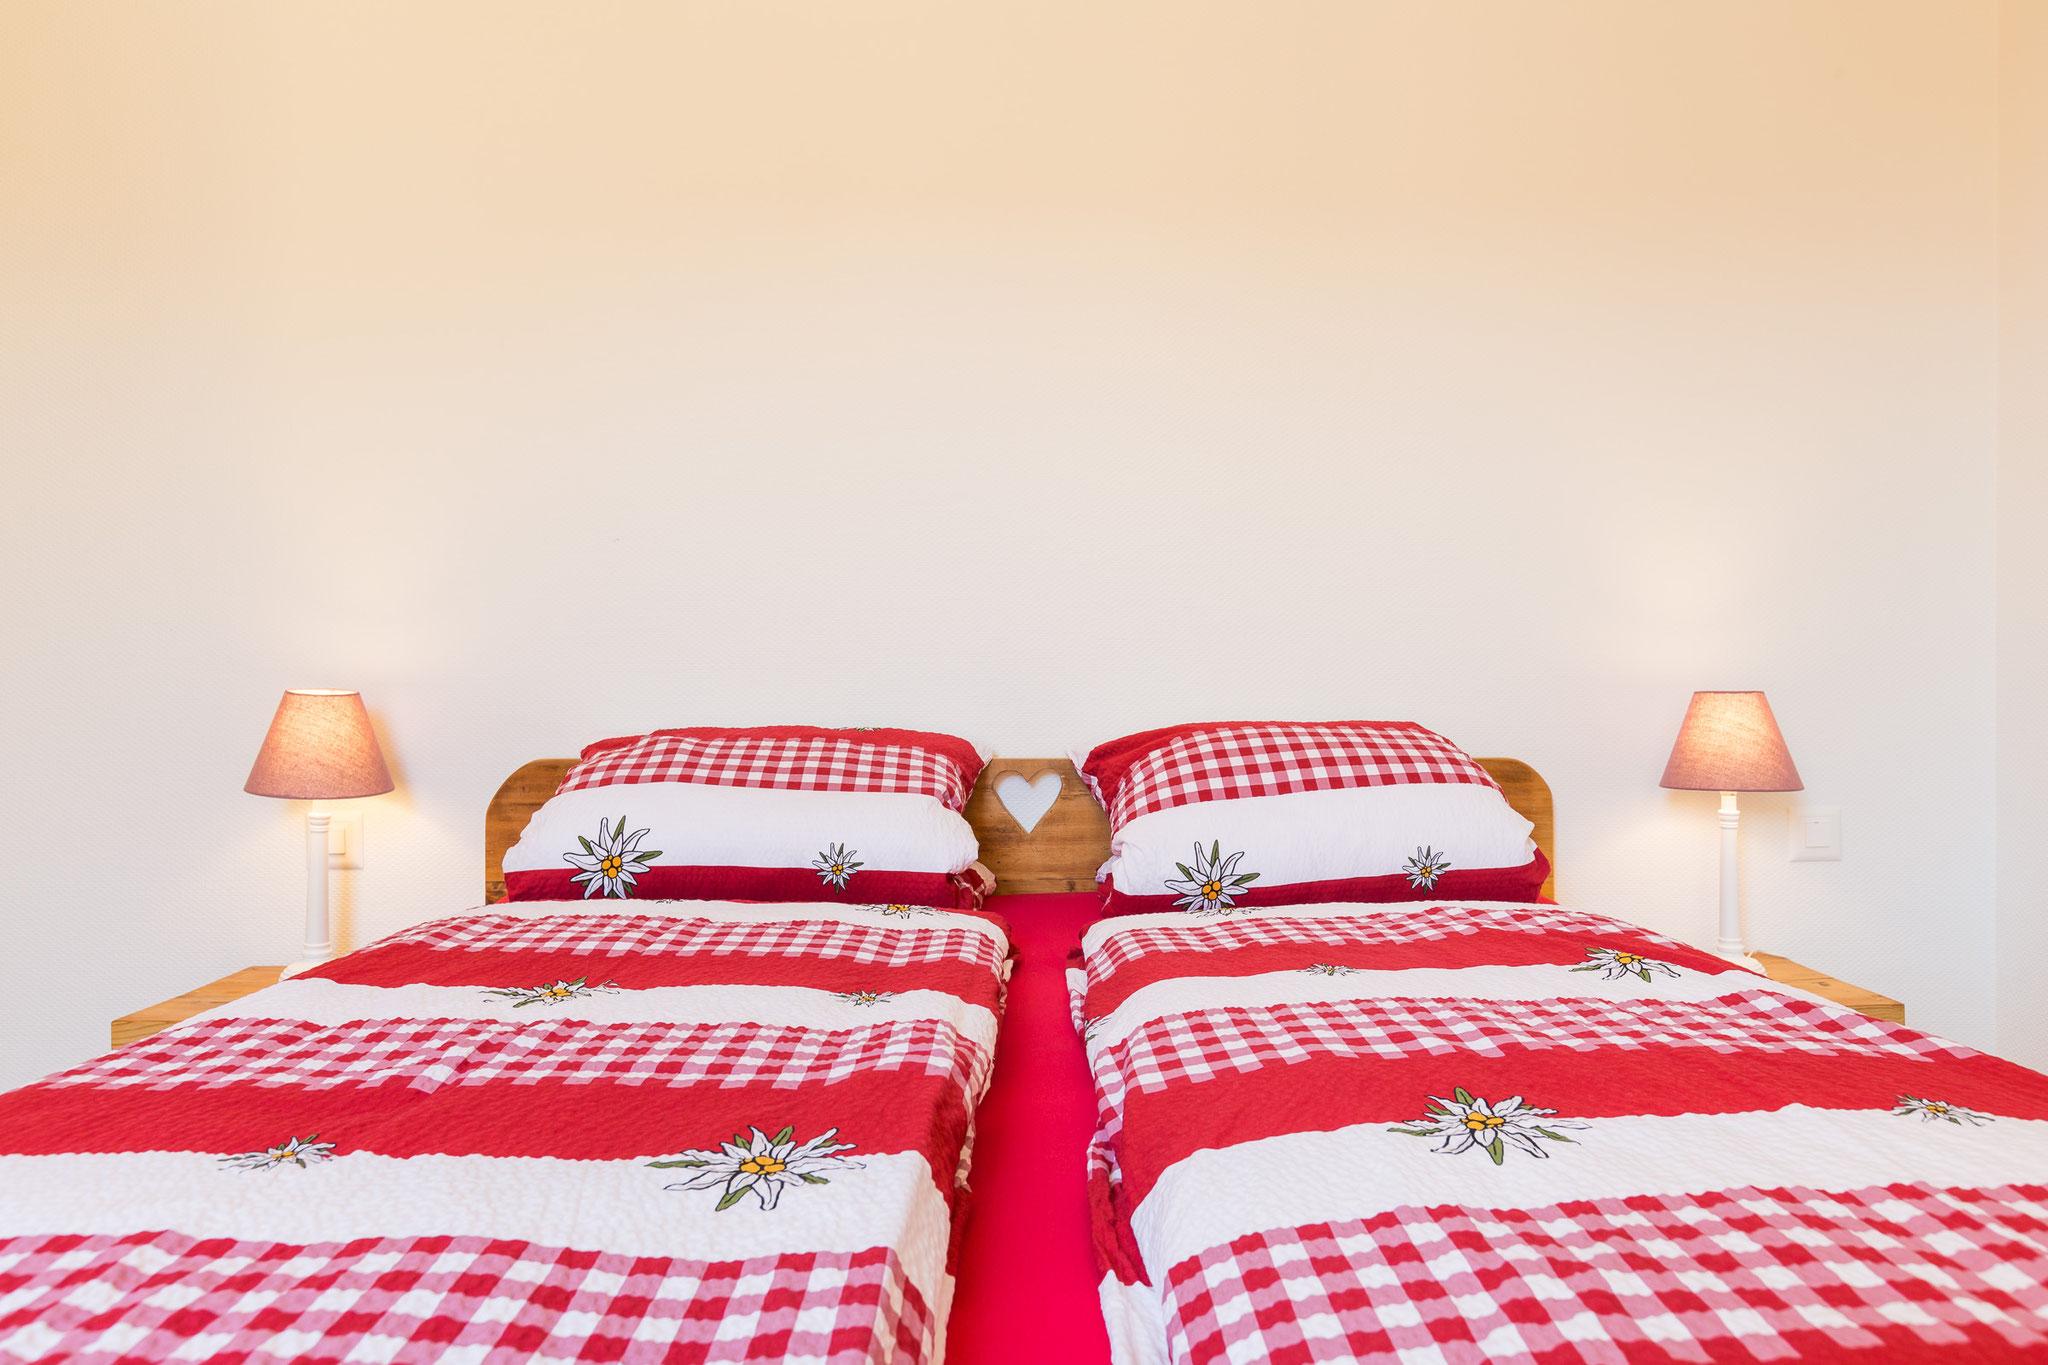 bedroom #1 (photo 2/3)